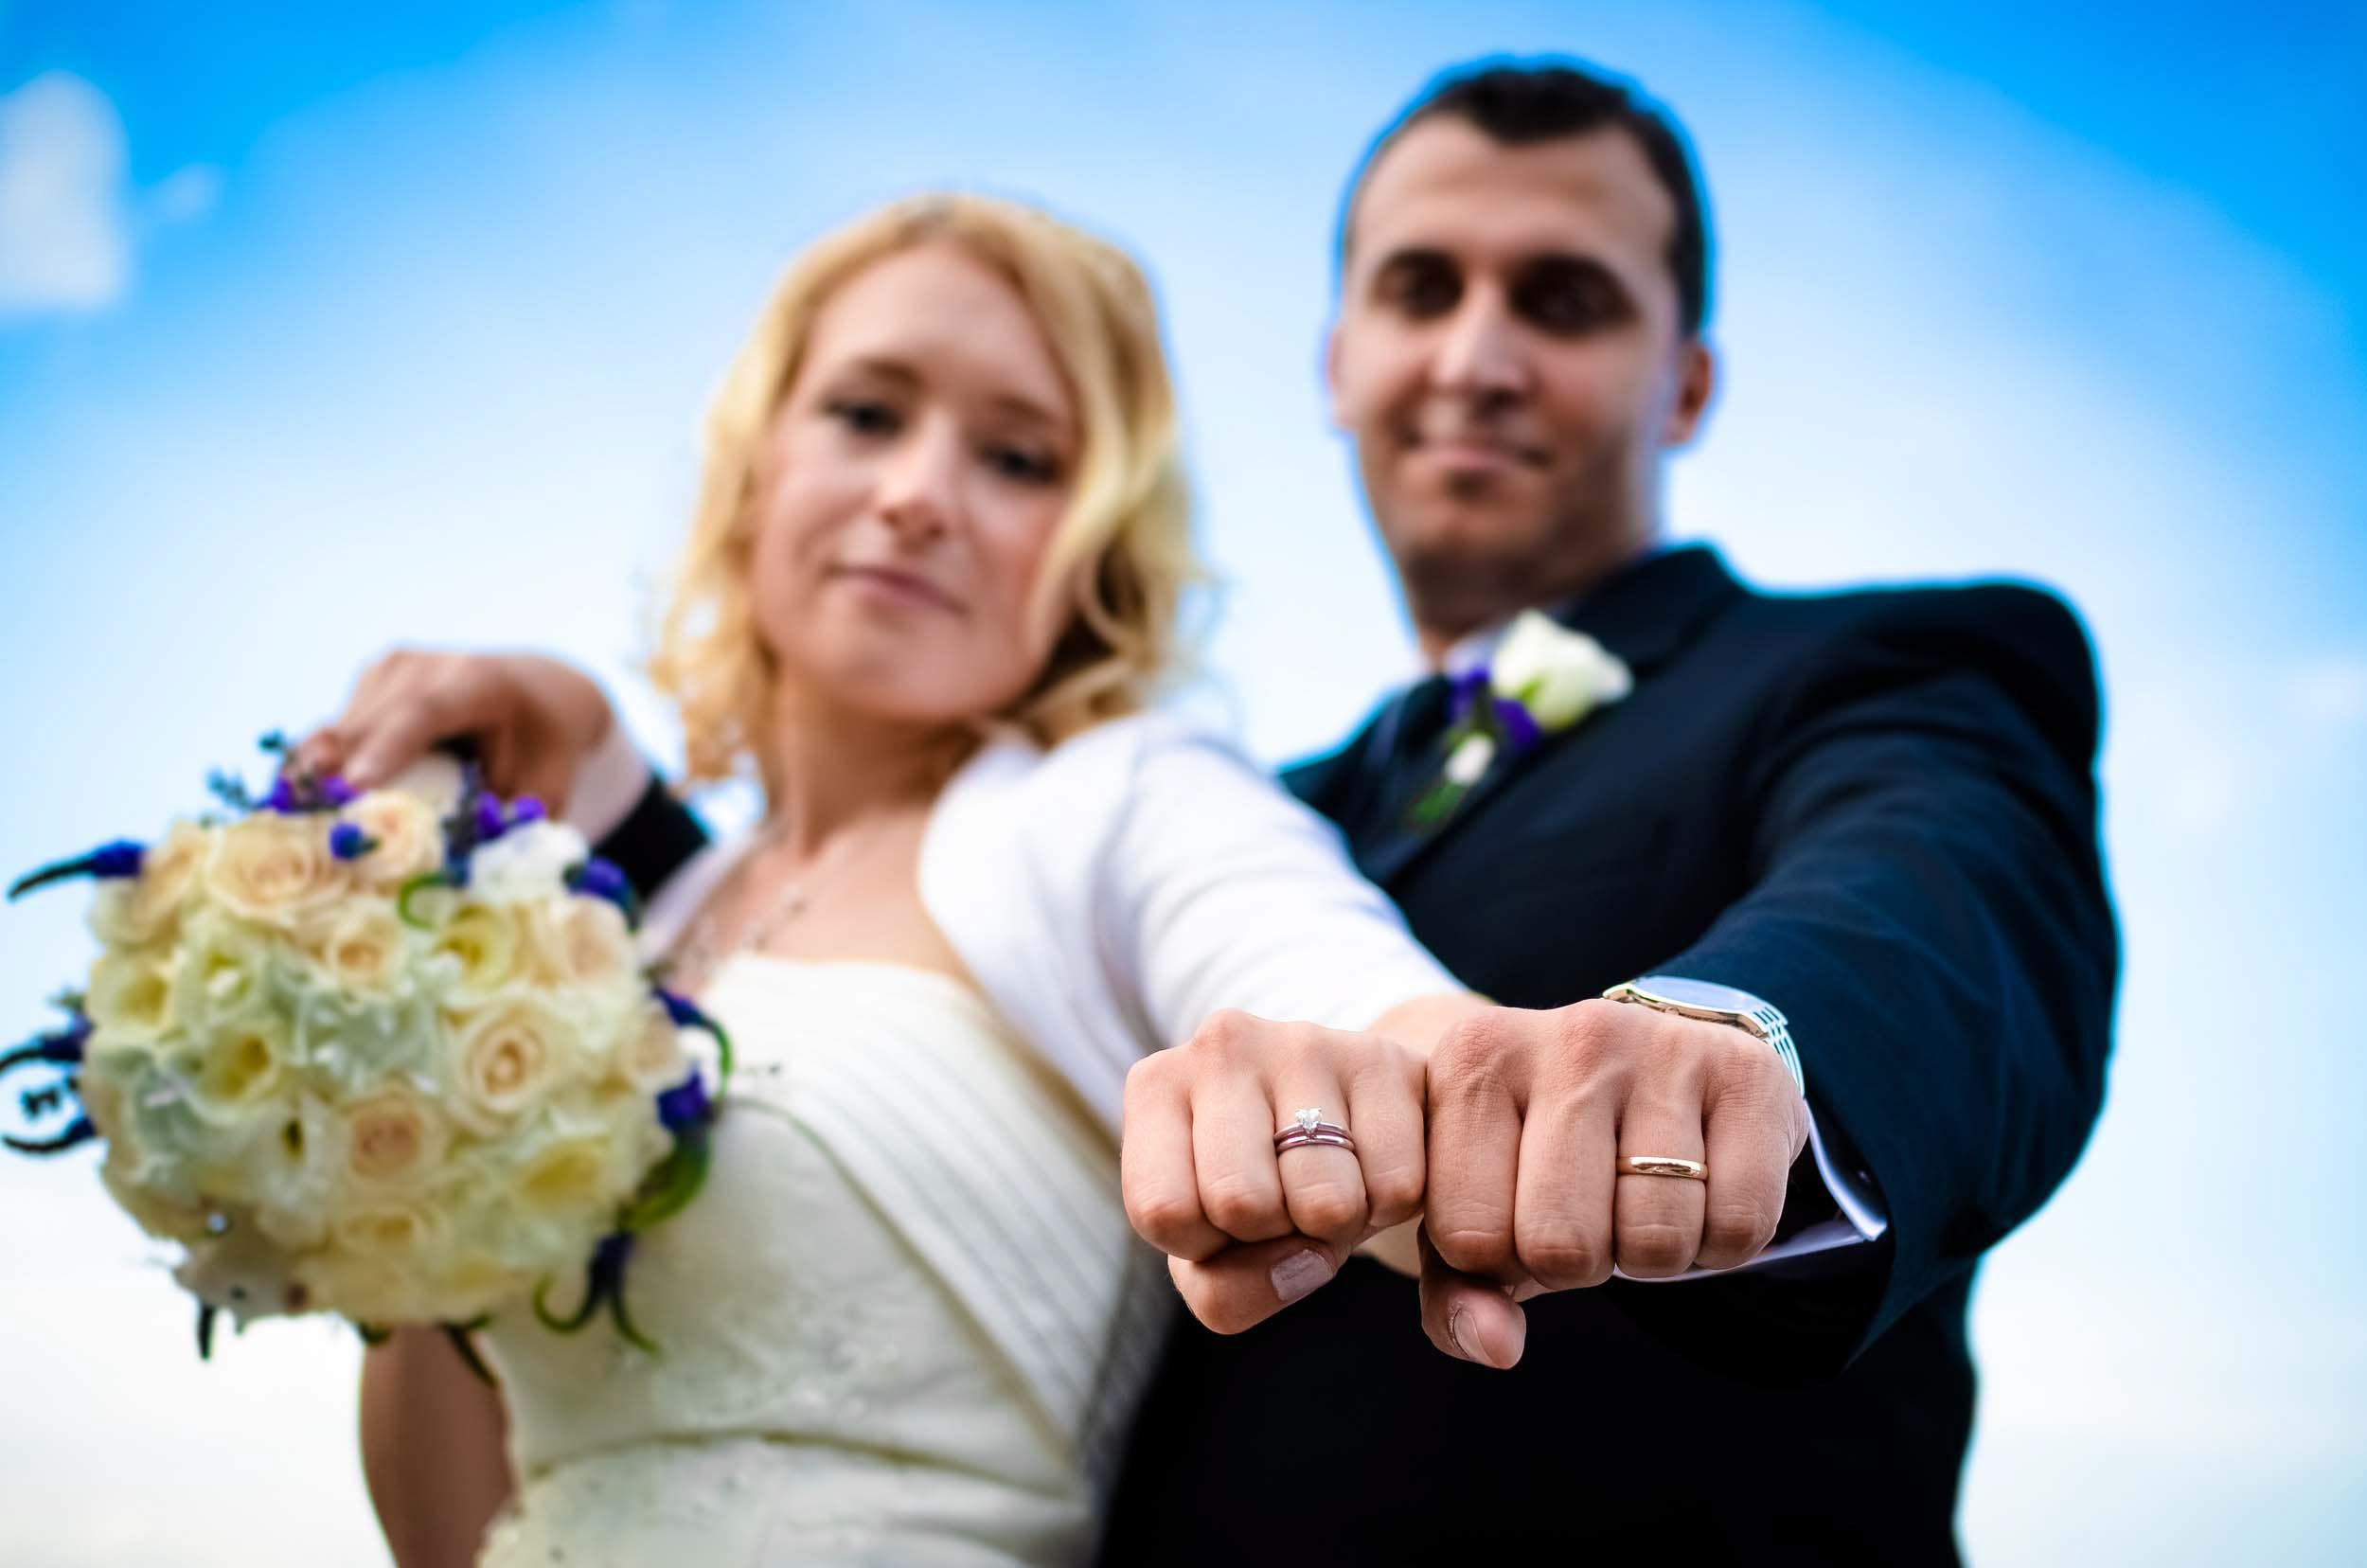 dc+metro+wedding+photographer+vadym+guliuk+photography+wedding+bride+and+groom-2020.jpg